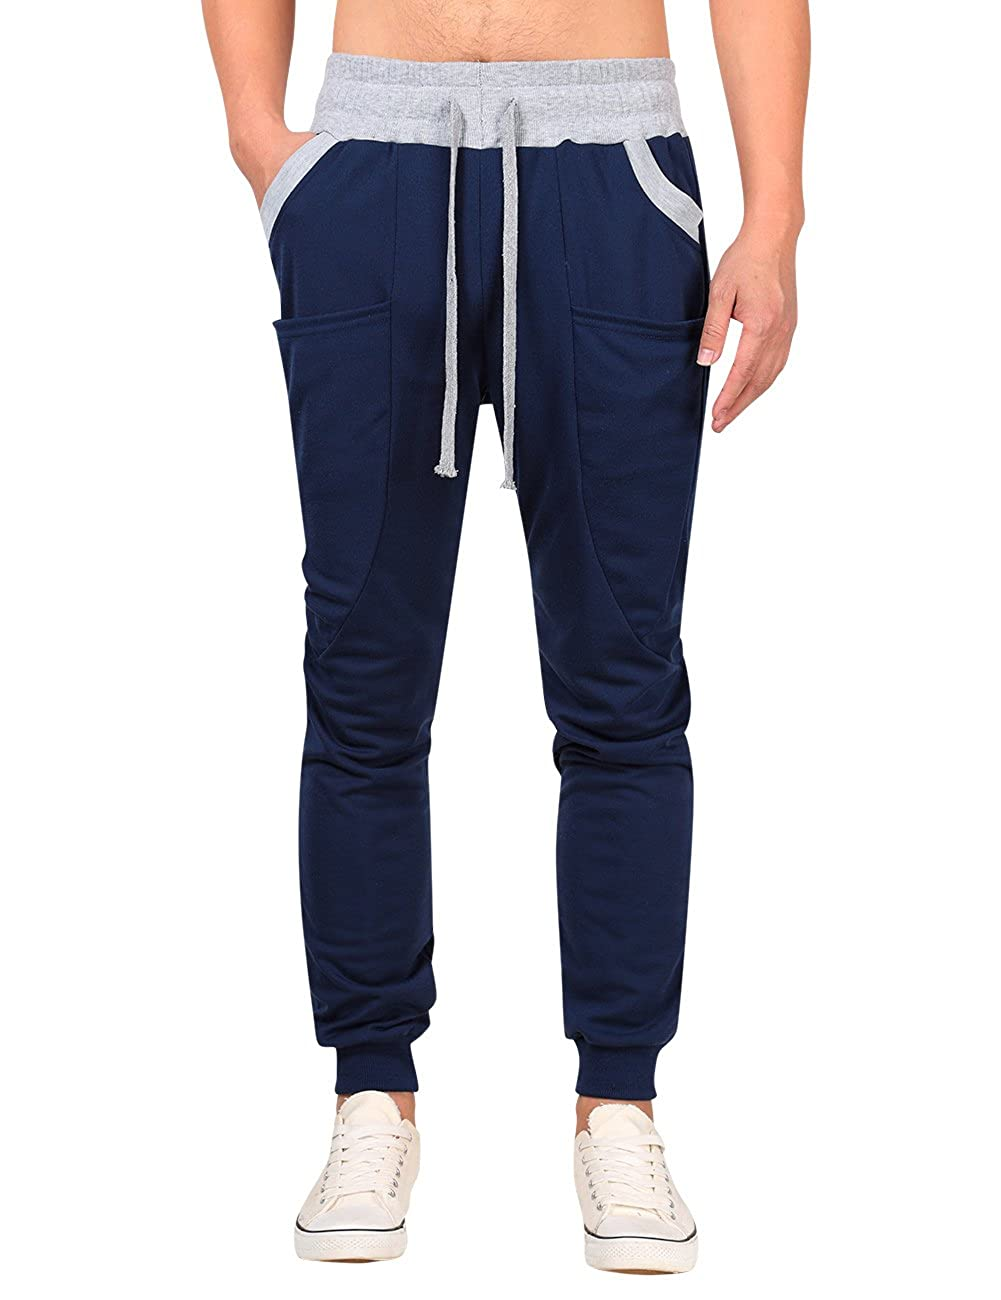 cf0ea6449c0c68 Yong Horse Mens Casual Sweat Pants Drawstring Stitch Elastic Bottom Slim  Fit Joggers (XL Navy) at Amazon Men's Clothing store: